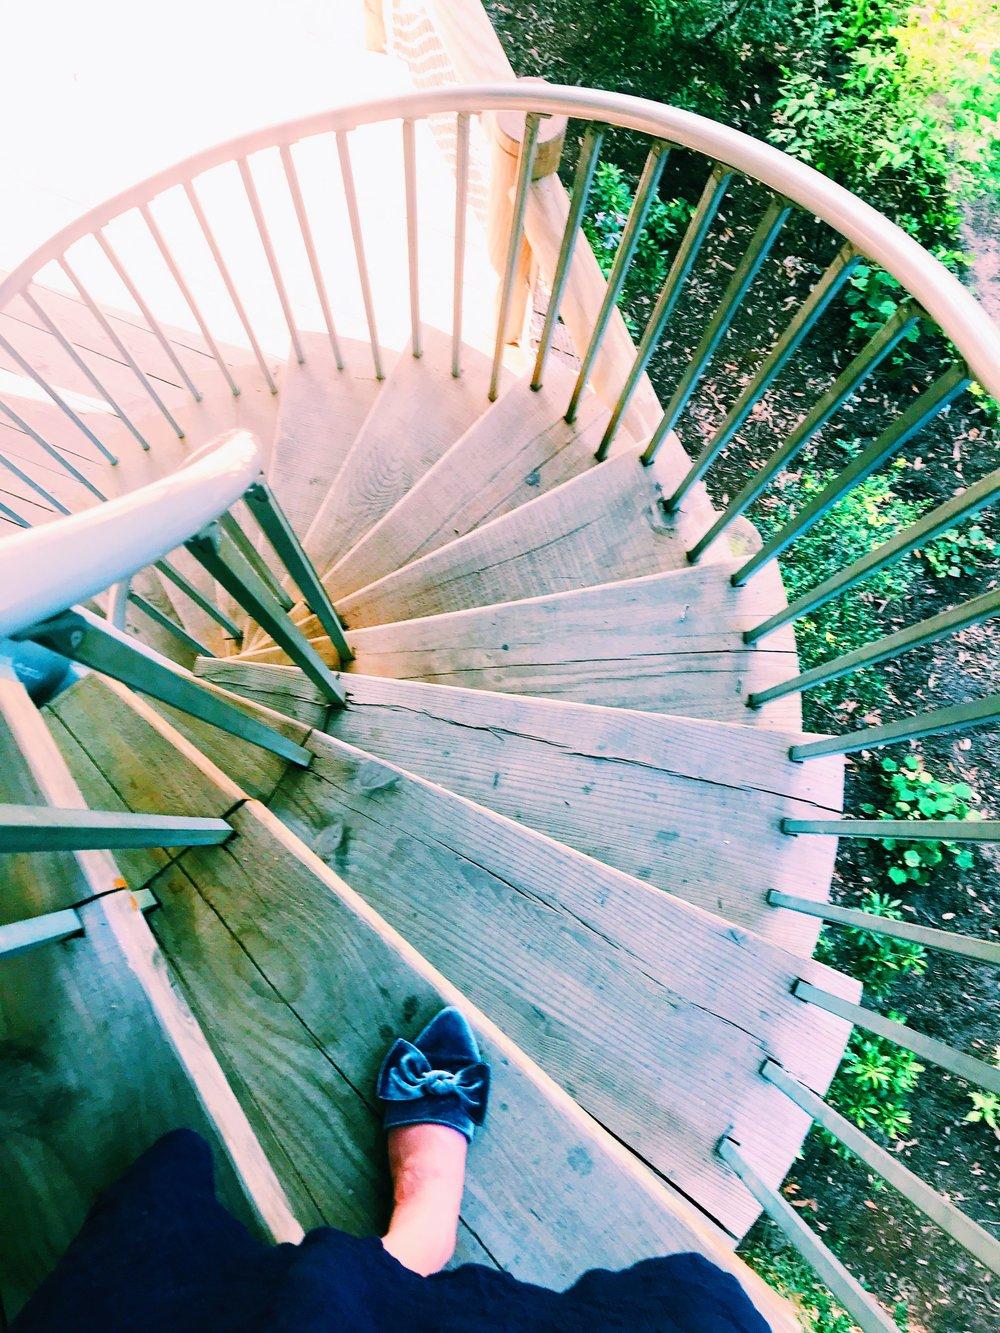 Three Heel Clicks - Treehouse Adventures (16) - Copy.jpg